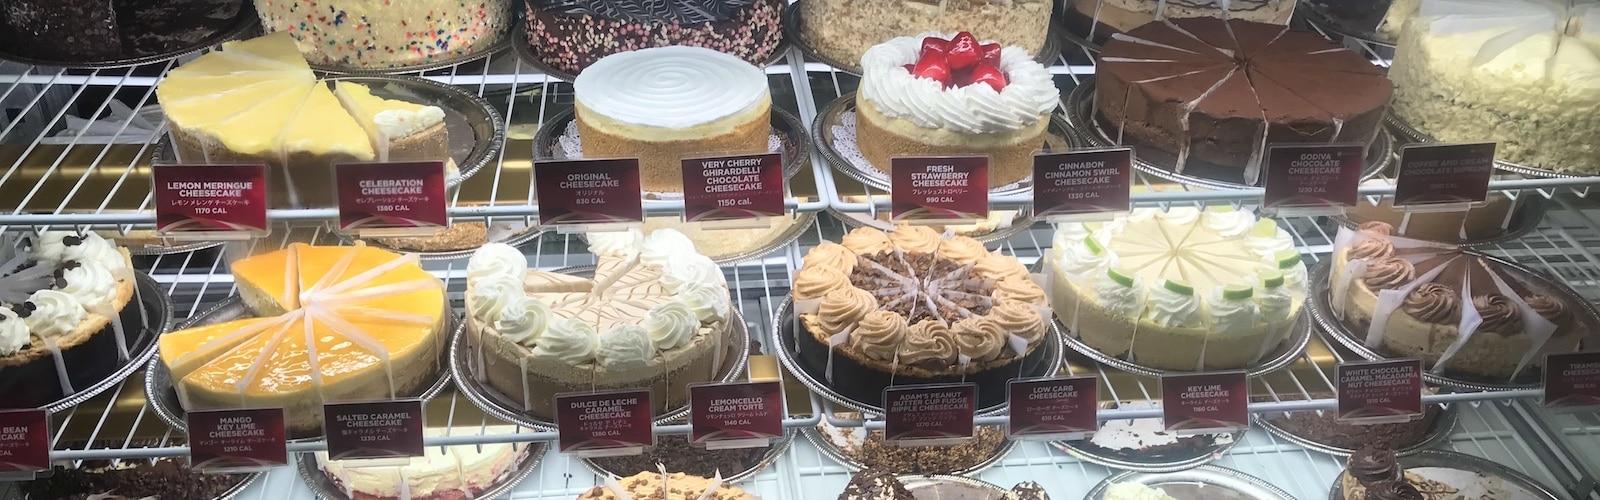 The Cheesecake Factory Waikiki, Best Dessert in Waikiki, Oahu, Hawaii